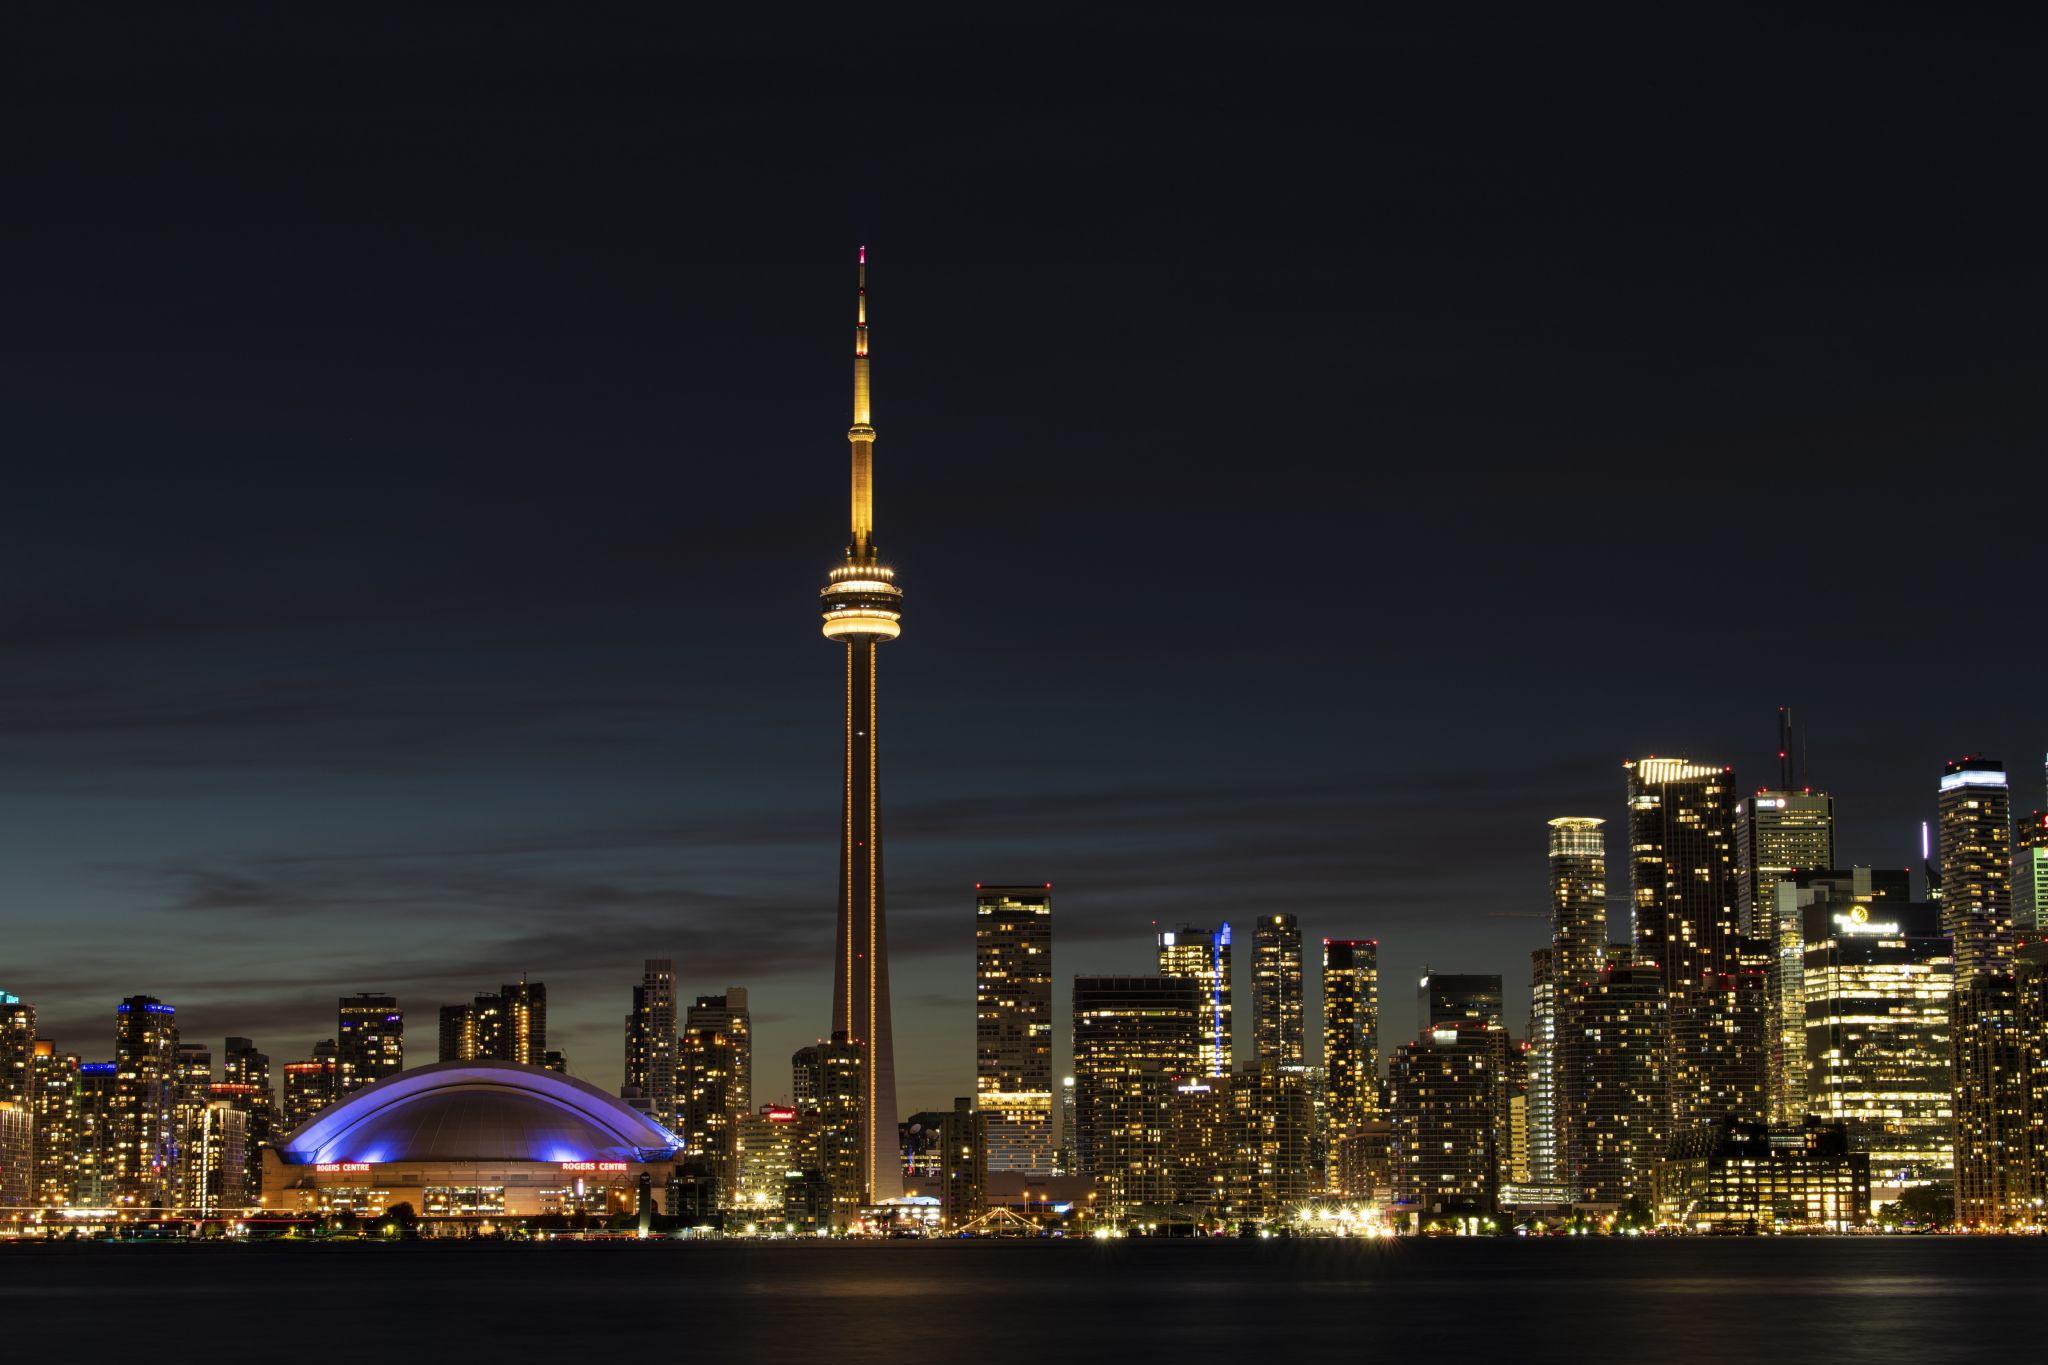 Toronto Island, Canada